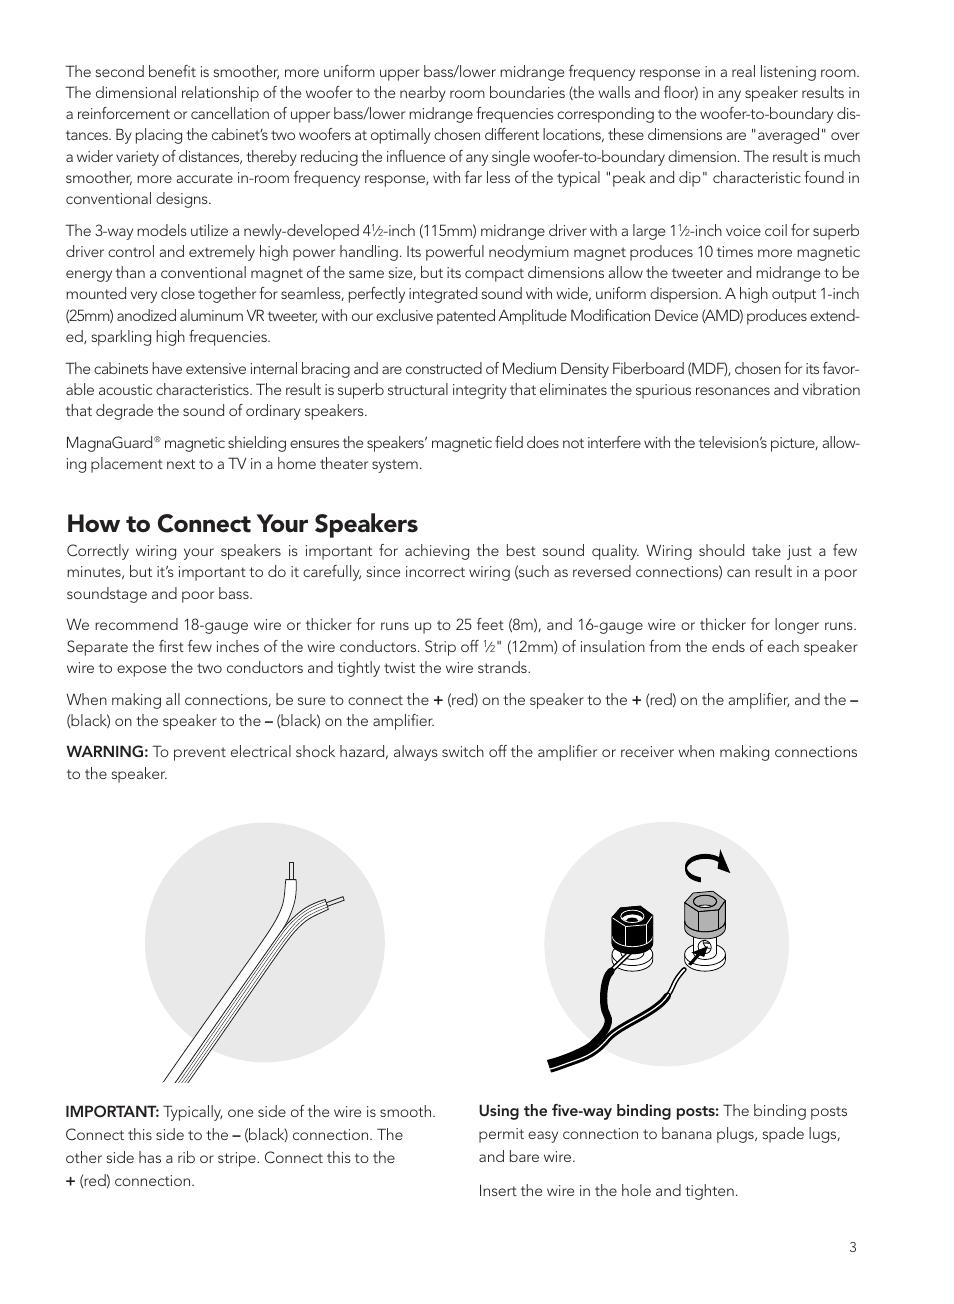 how to connect your speakers boston acoustics vrc user manual rh manualsdir com Boston Acoustics TV 20 Boston Acoustics A150 Speakers